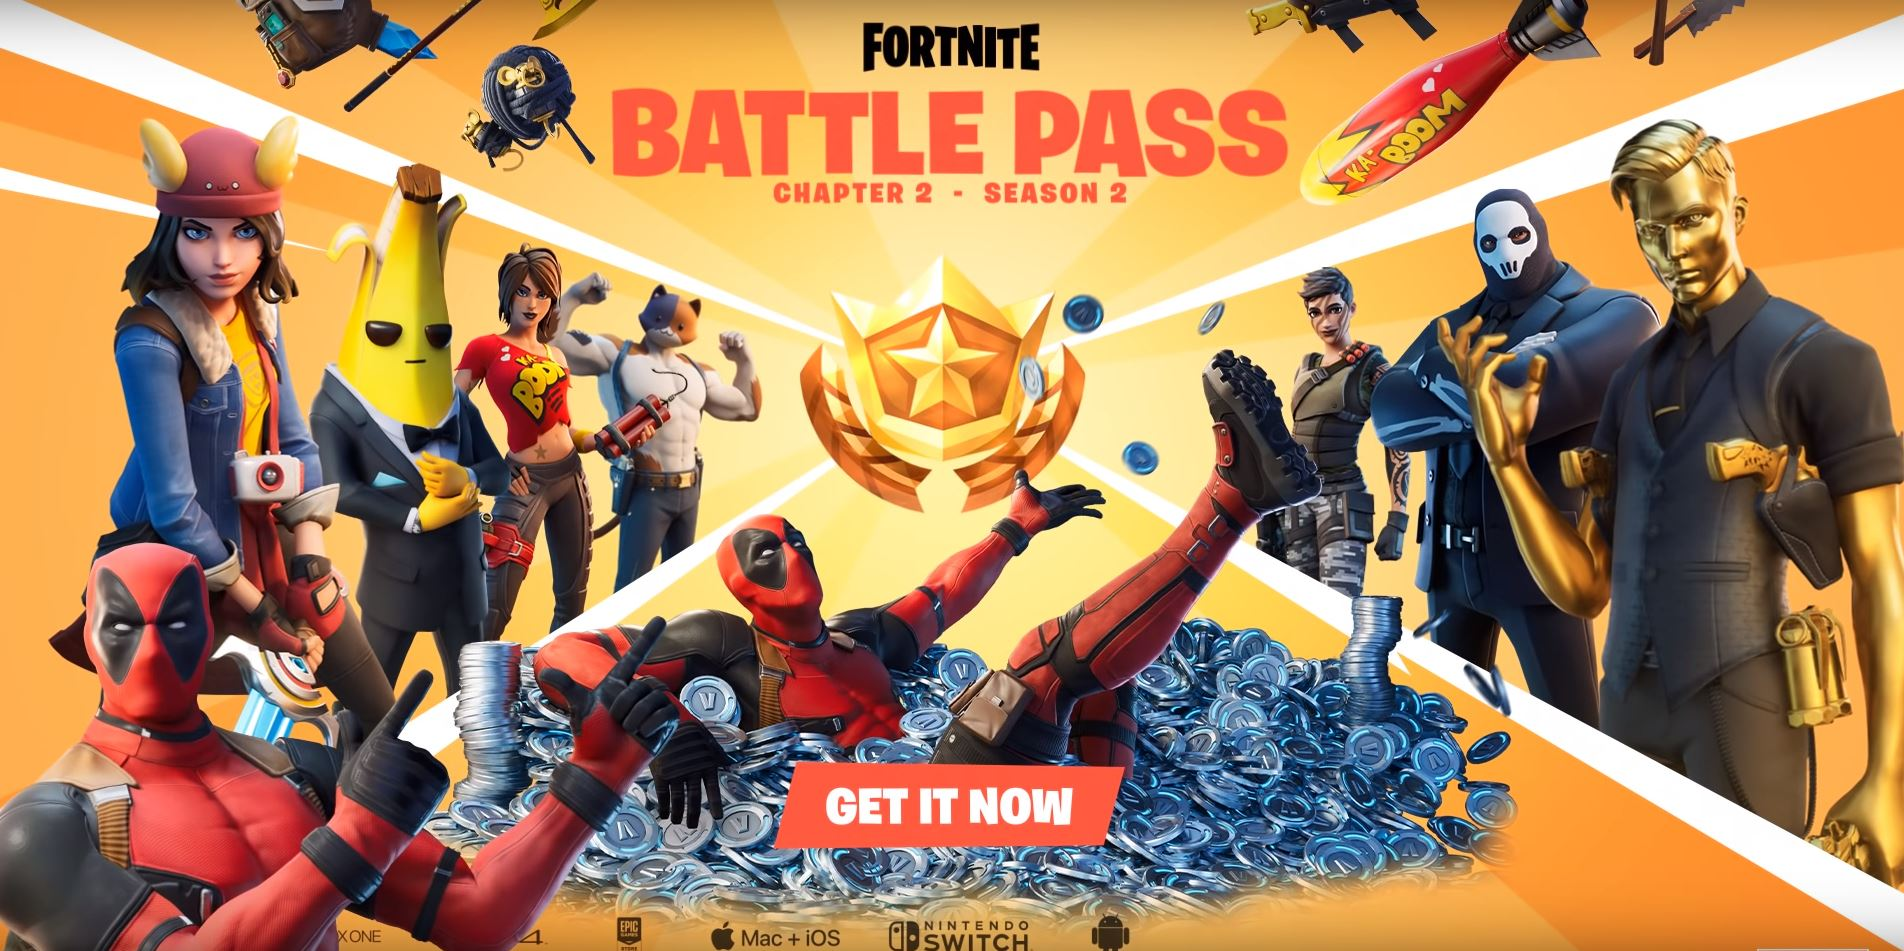 Fortnite Chapter 2 Season 2 Battle Pass